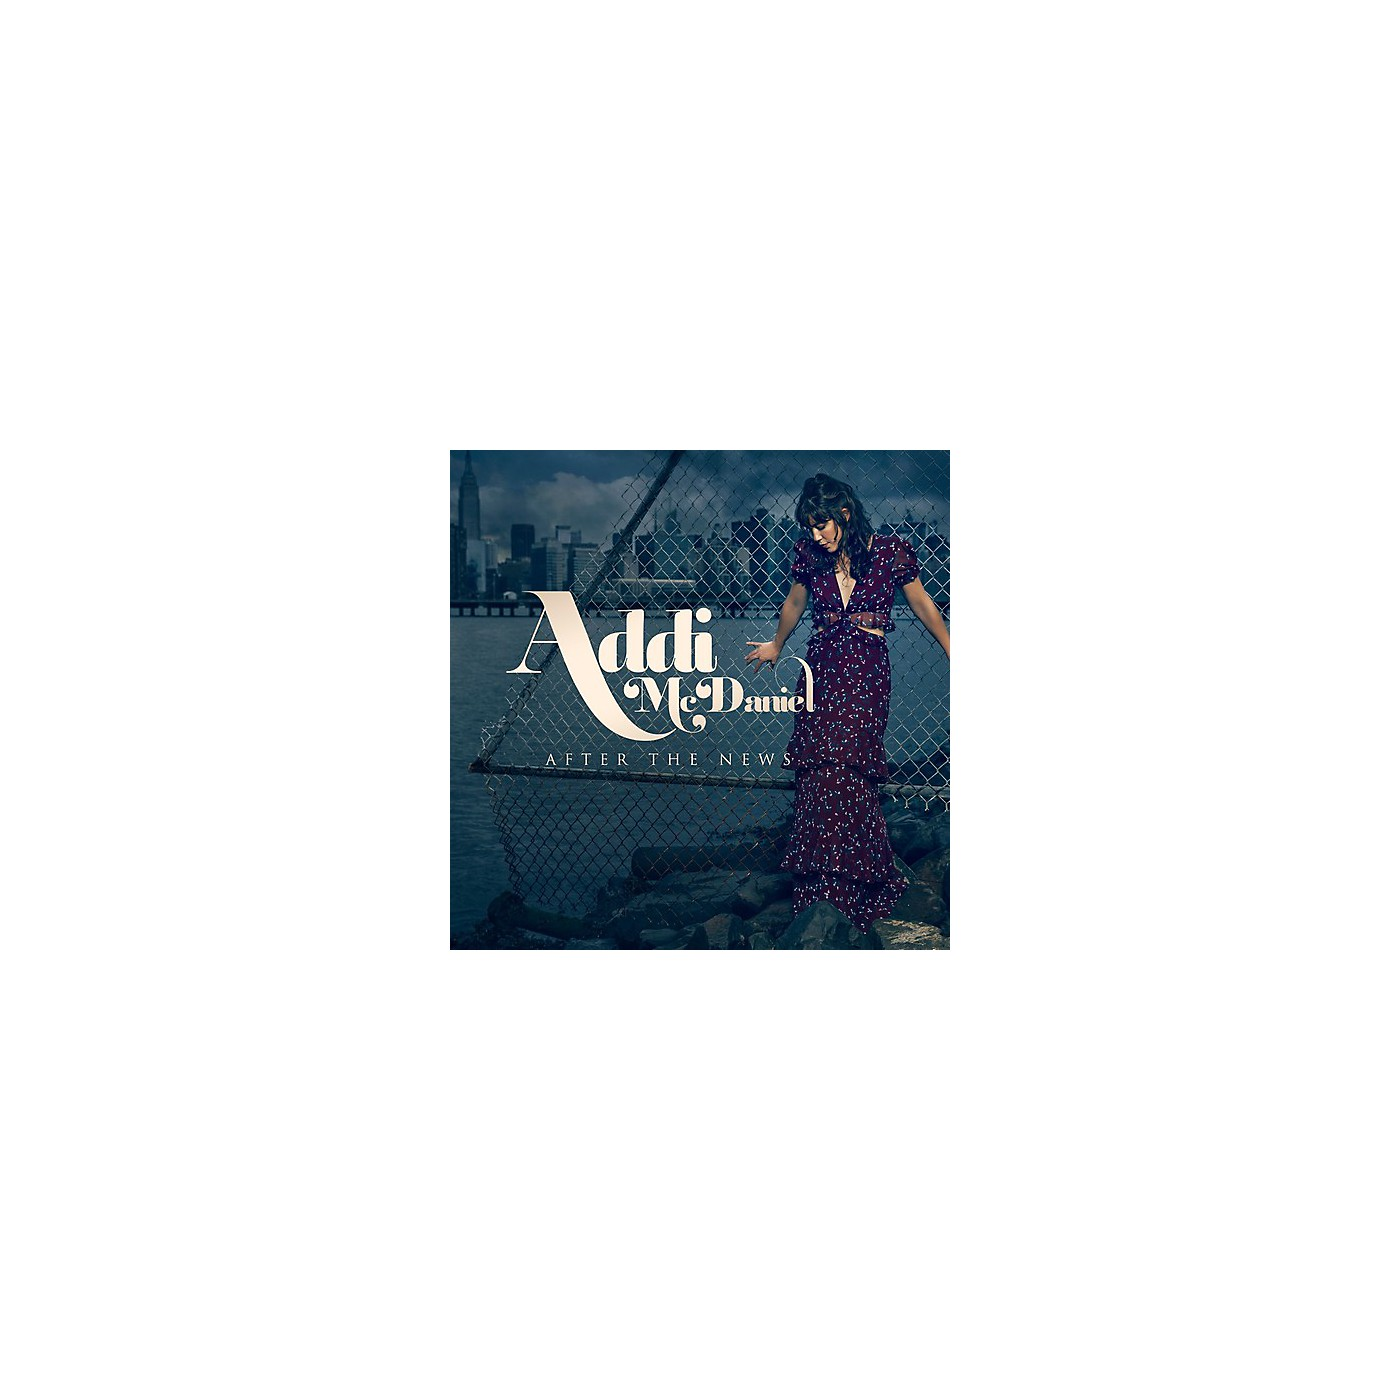 Alliance Addi McDaniel - After the News (CD) thumbnail